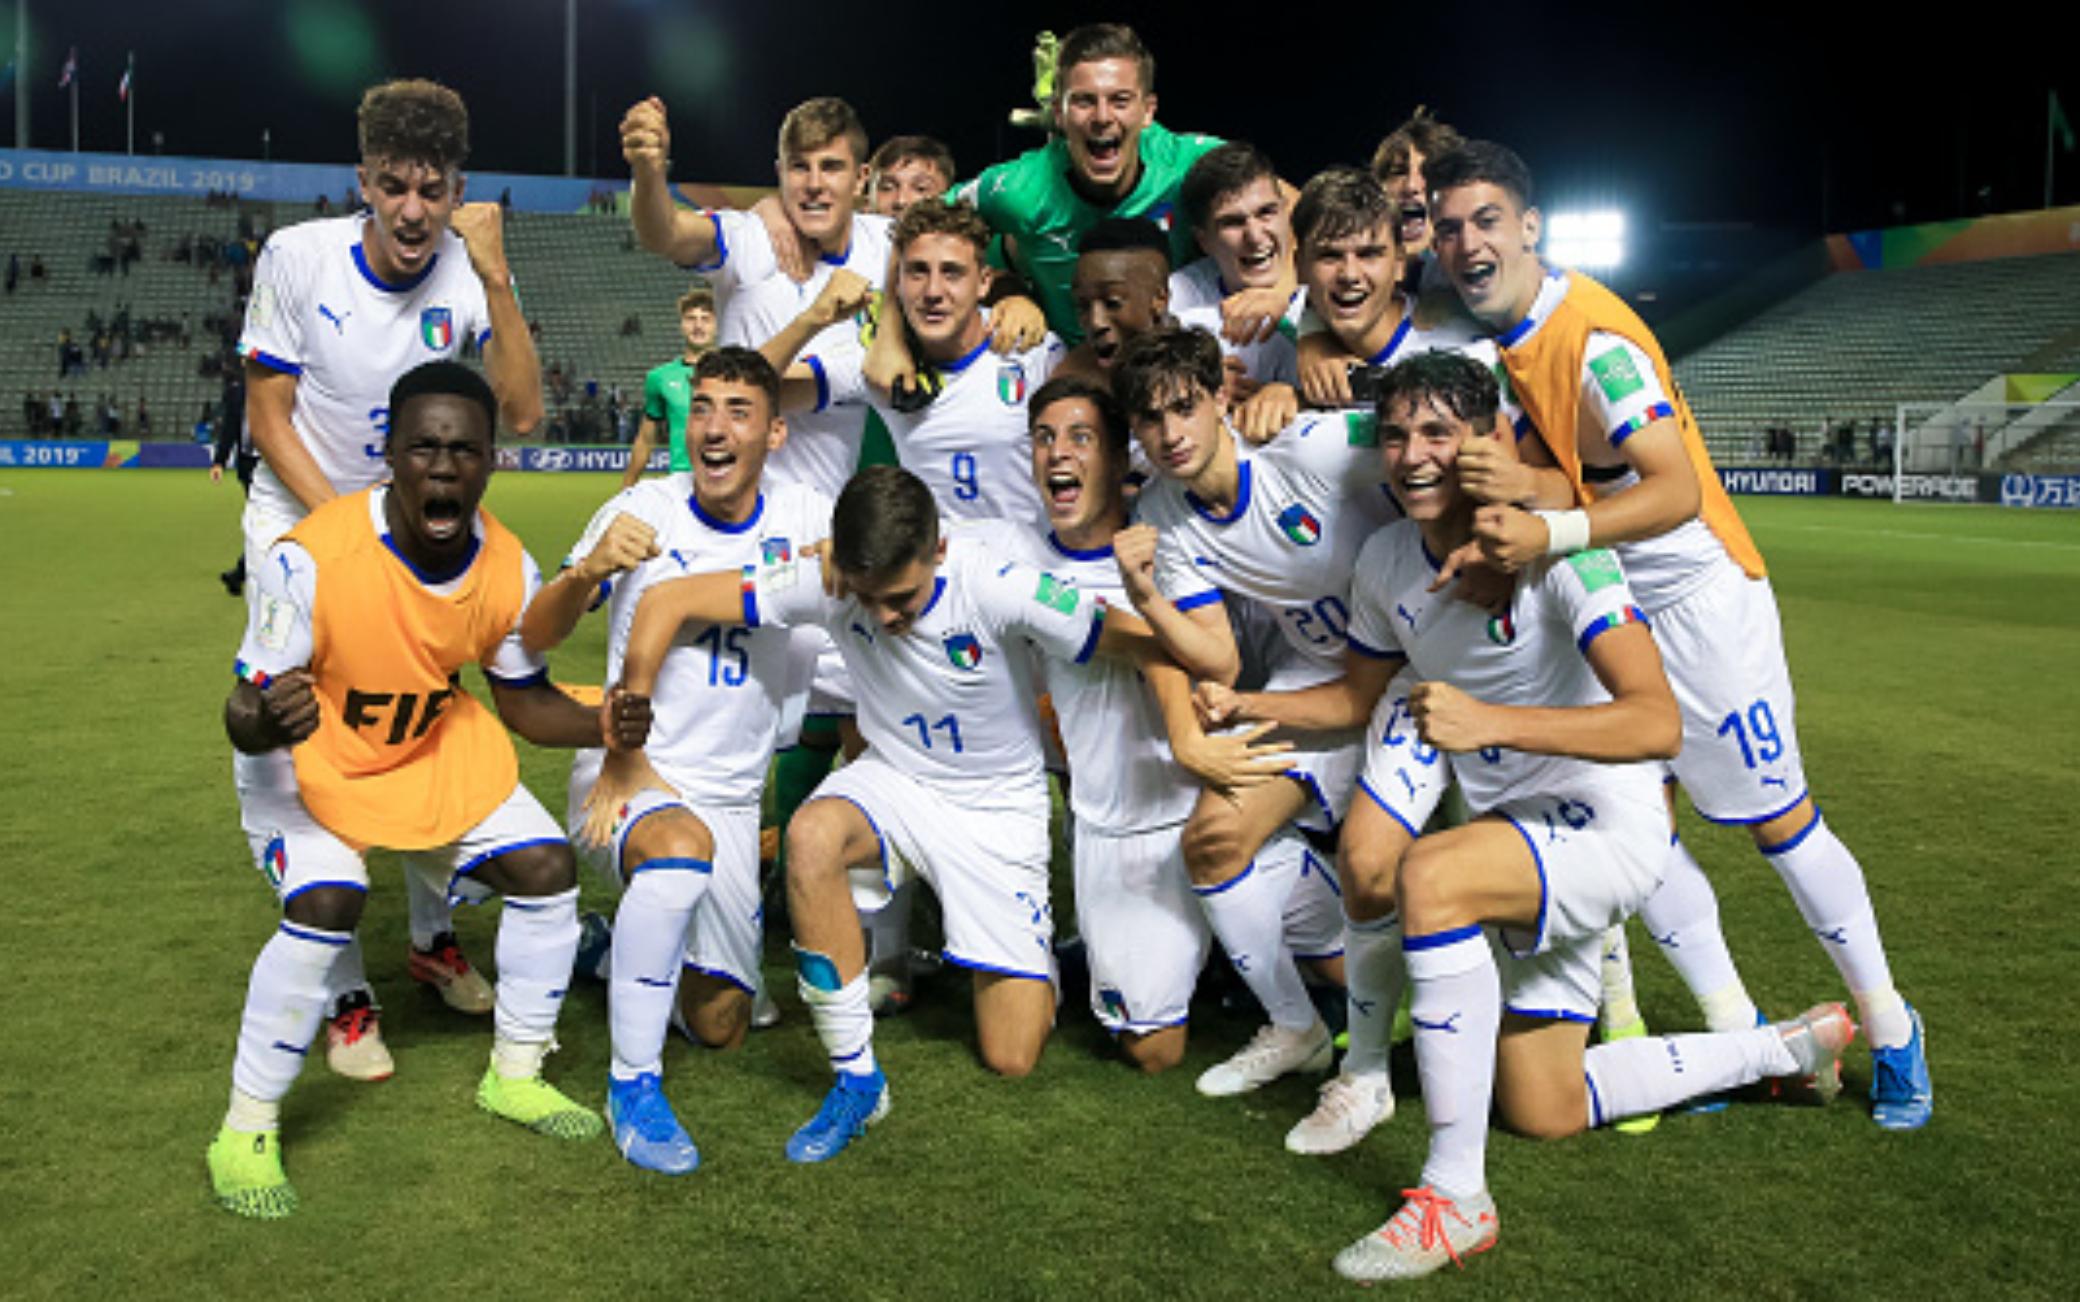 Mondiale U17 2019 – Fase a gruppi – Shock Olanda, bene l'Italia